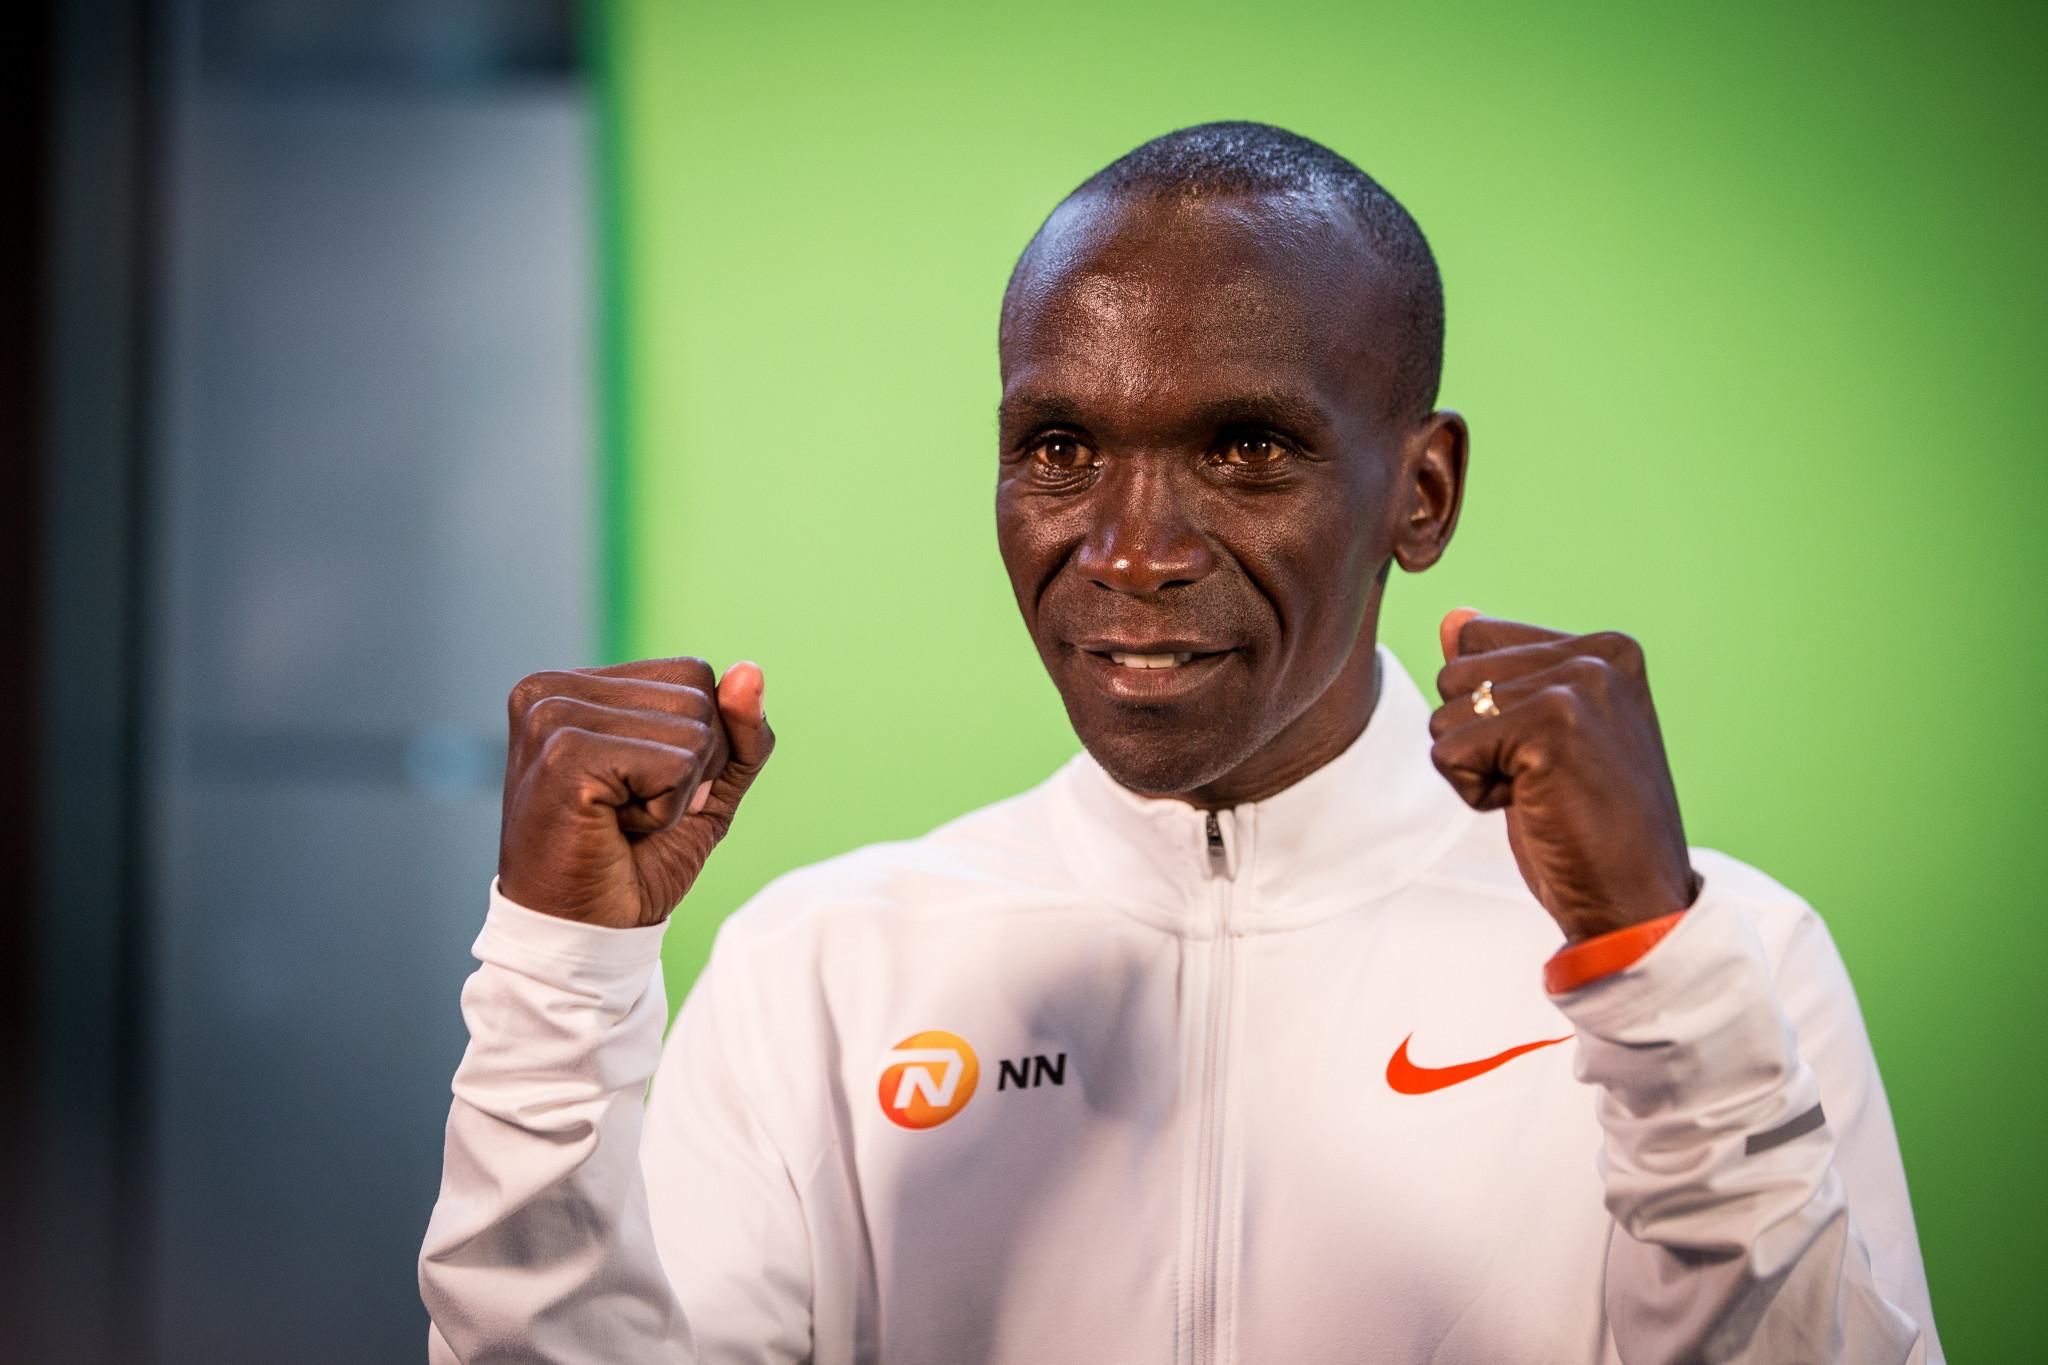 Kenya's Eliud Kipchoge could break the men's marathon world record in Berlin ©Getty Images